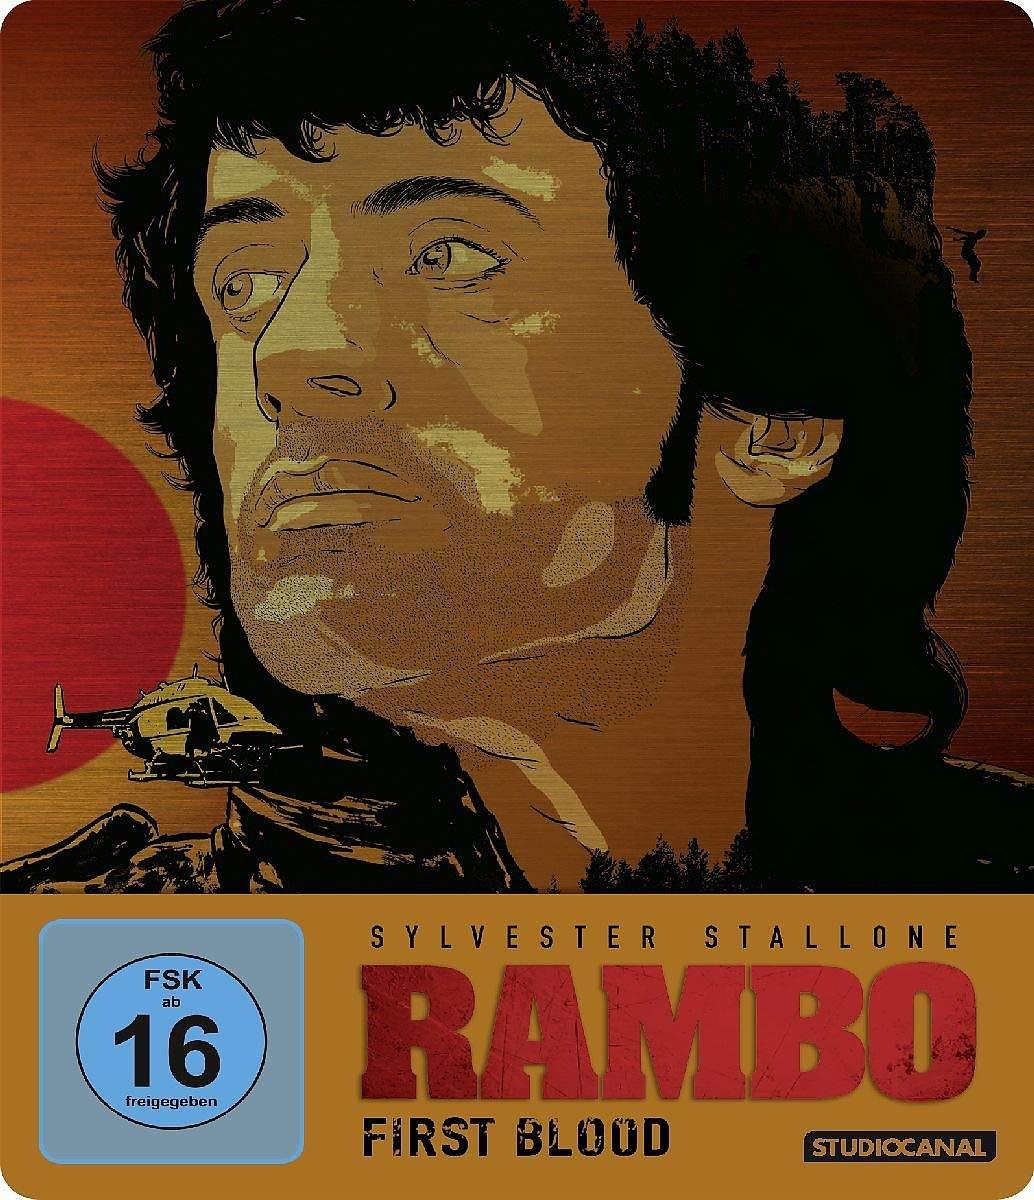 Rambo - First Blood: Limited Steelbook Edition: Amazon.es: Kozoll, Michael, Stallone, Sylvester, Sackheim, William, Stallone, Sylvester, Crenna, Richard, Dennehy, Brian, McKinney, Bill, Starrett, Jack, Talbott, Michael, Mulkey, Chris, McLiam, John ...